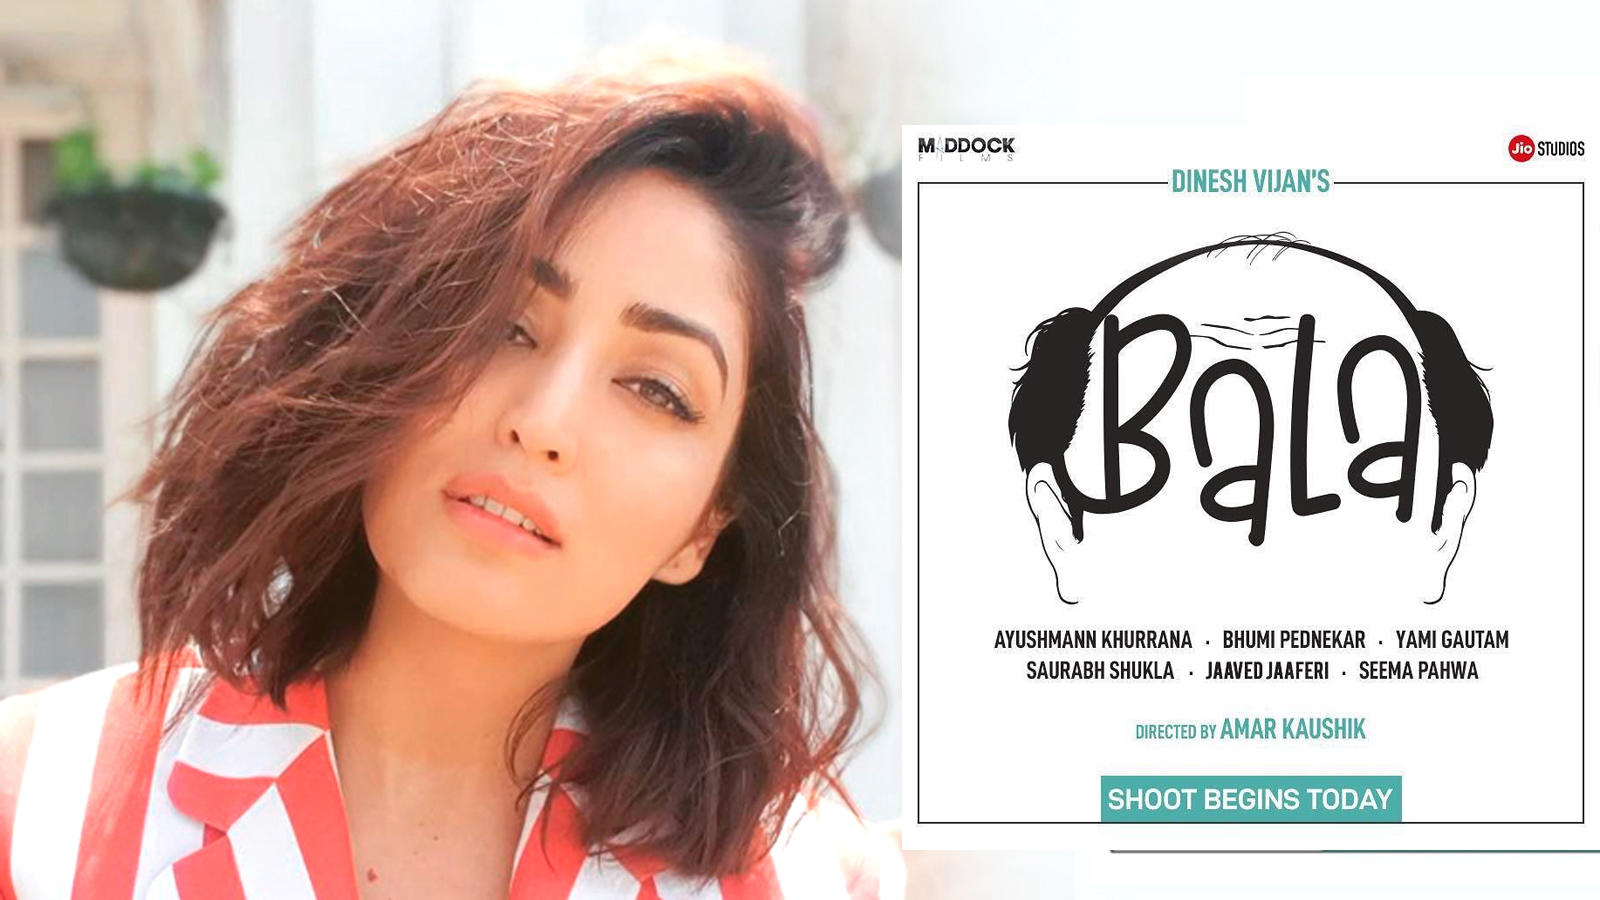 Yami Gautam joins cast of Ayushmann Khurrana and Bhumi Pednekar starrer 'Bala'